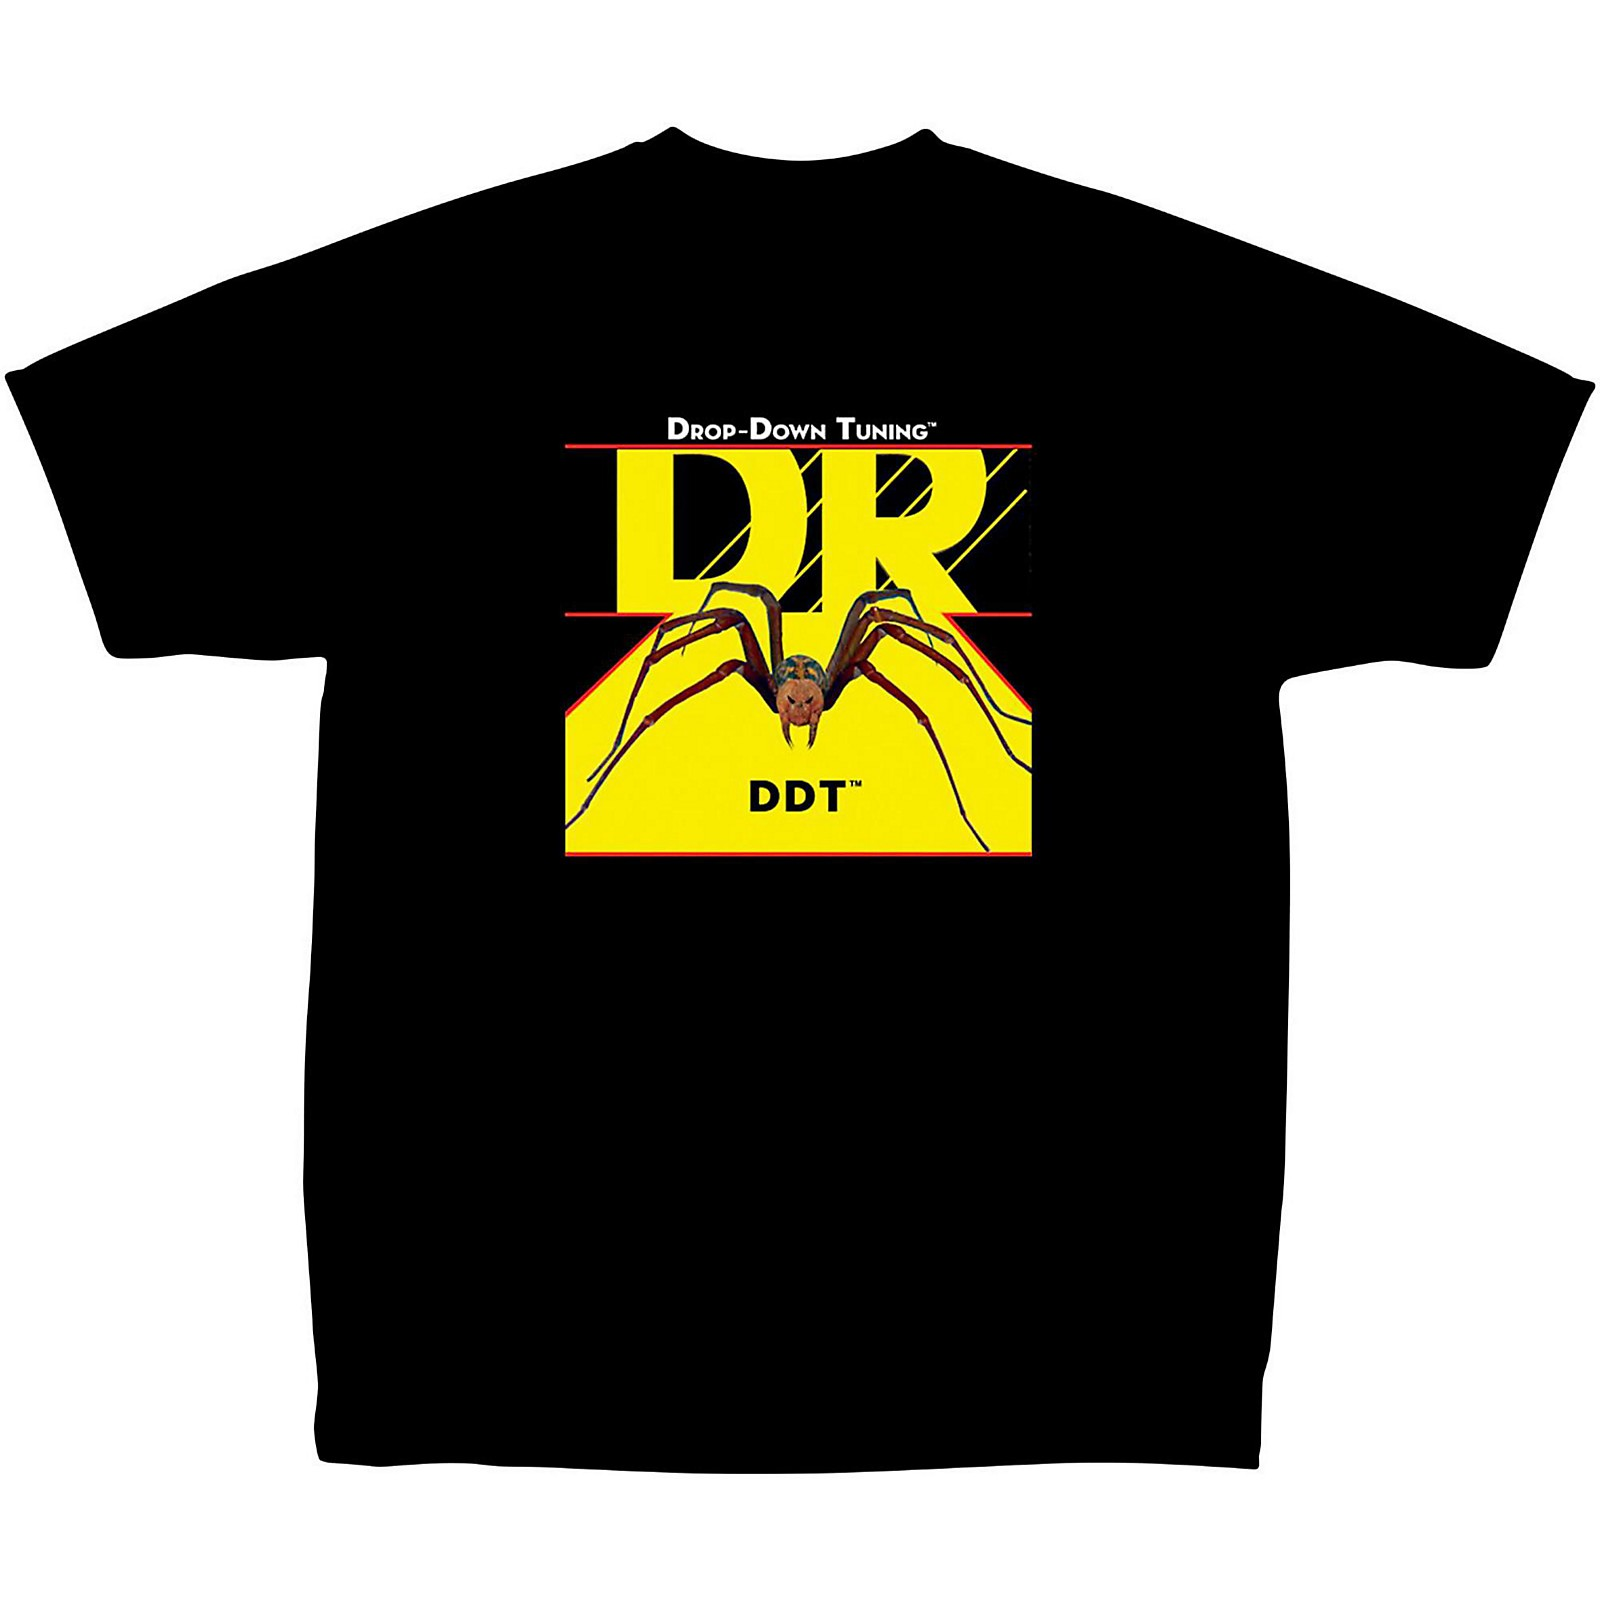 DR Strings DDT T-Shirt